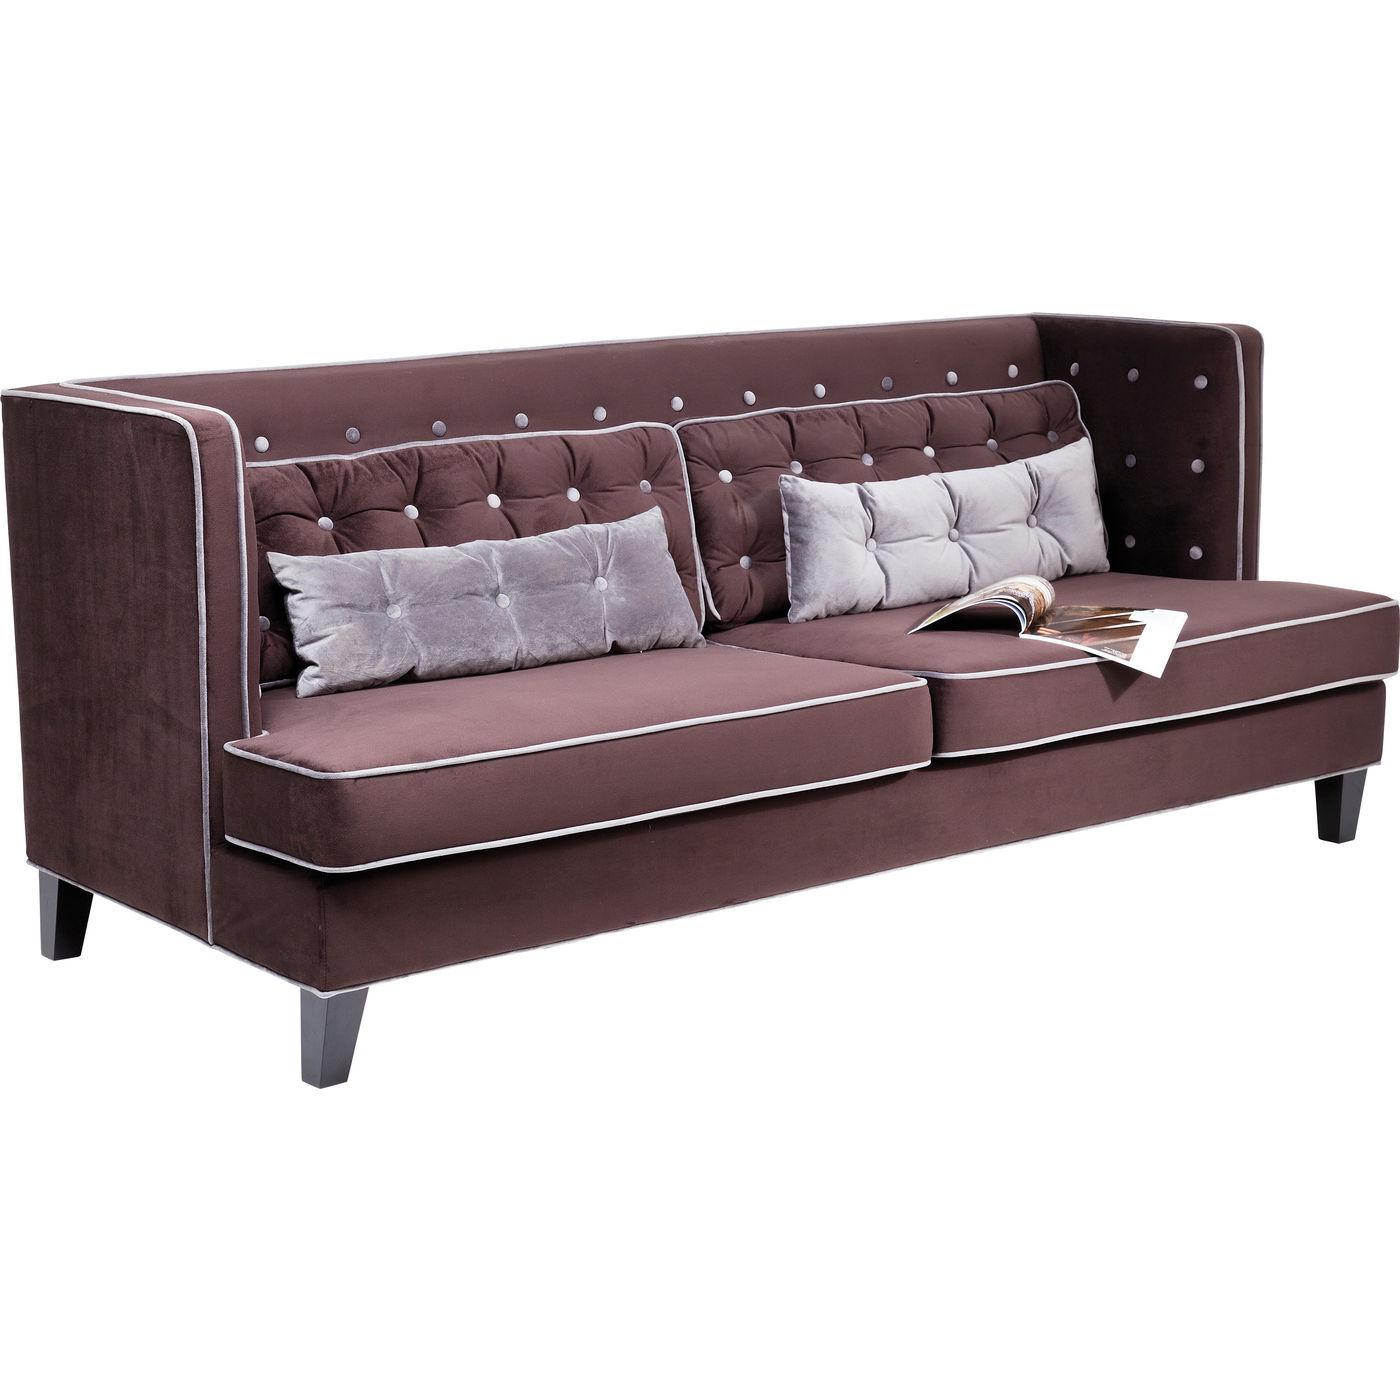 tre personers sofa